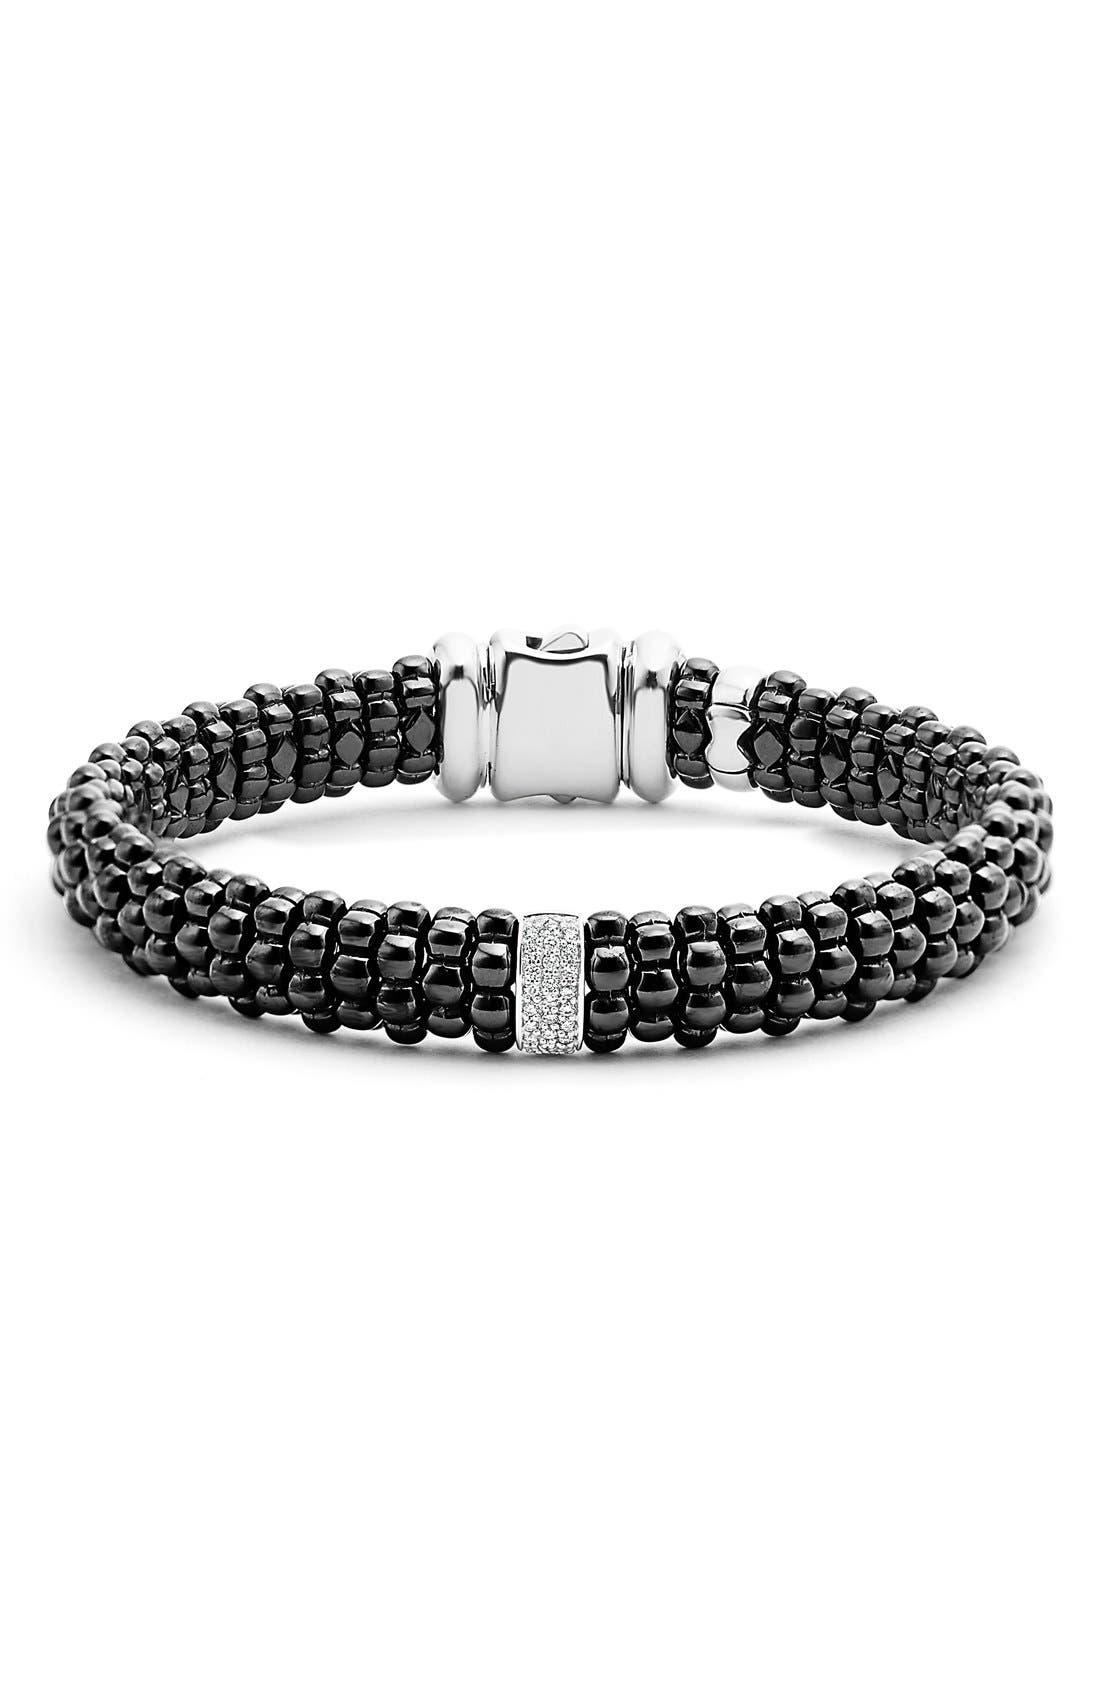 Black Caviar Bracelet,                         Main,                         color, Black/ Silver